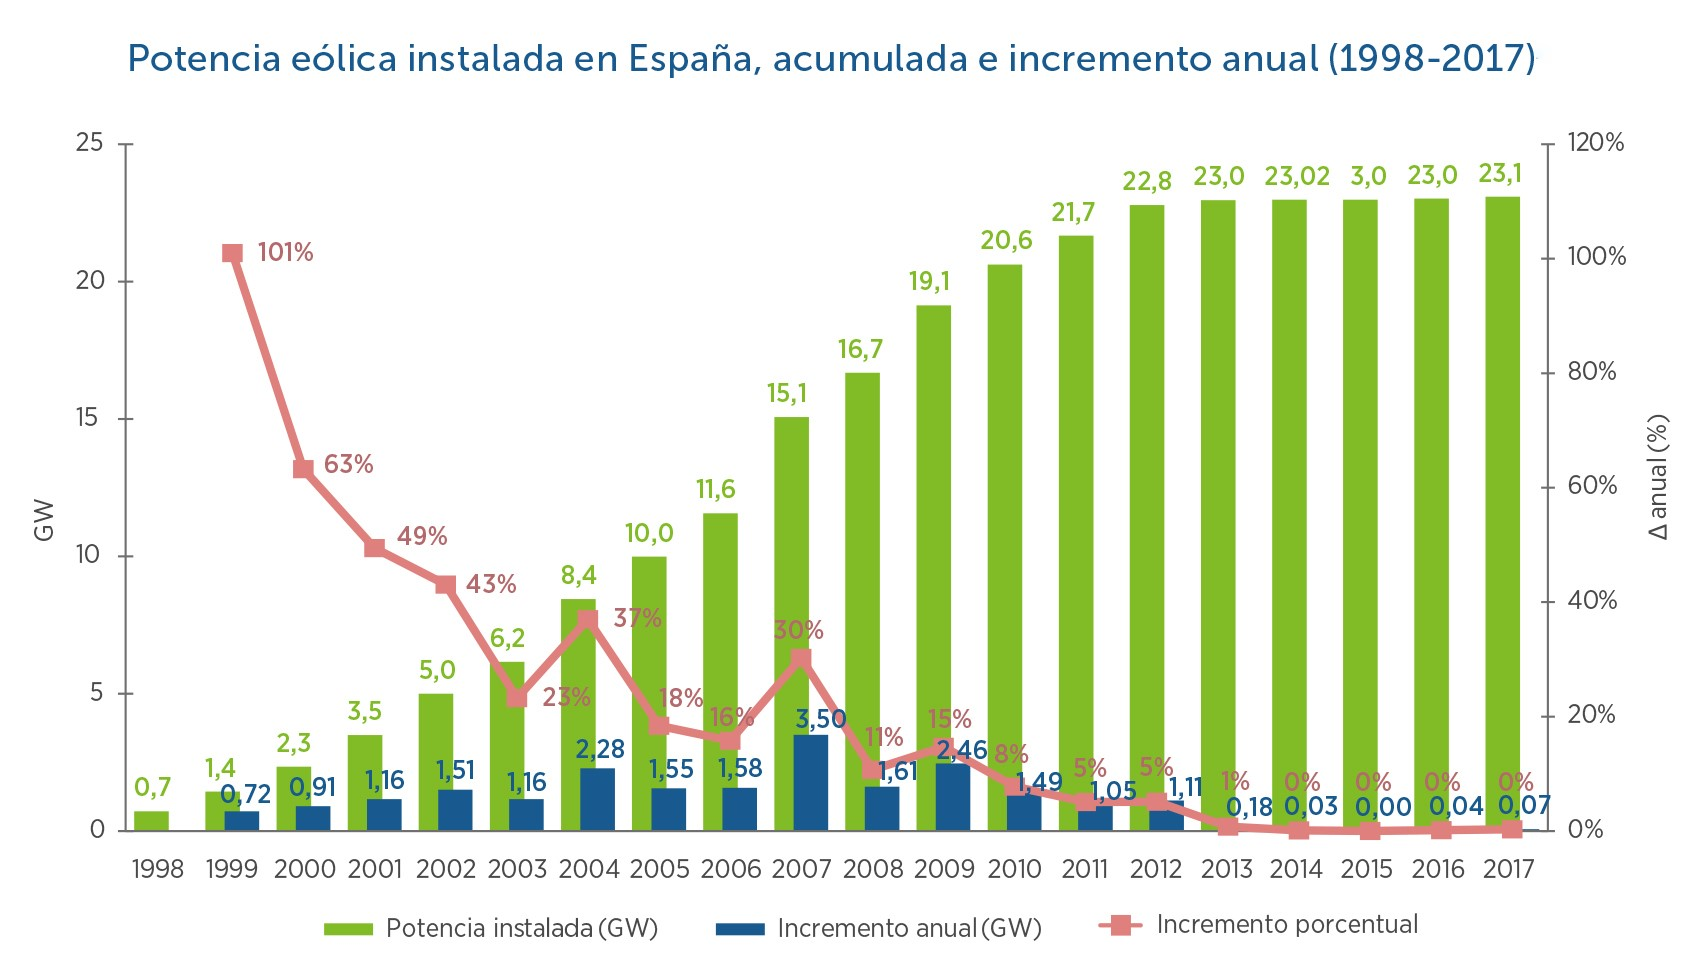 1-Potencia-elica-instalada-en-Espaa.-Acumulada-e-incremento-1998-2017